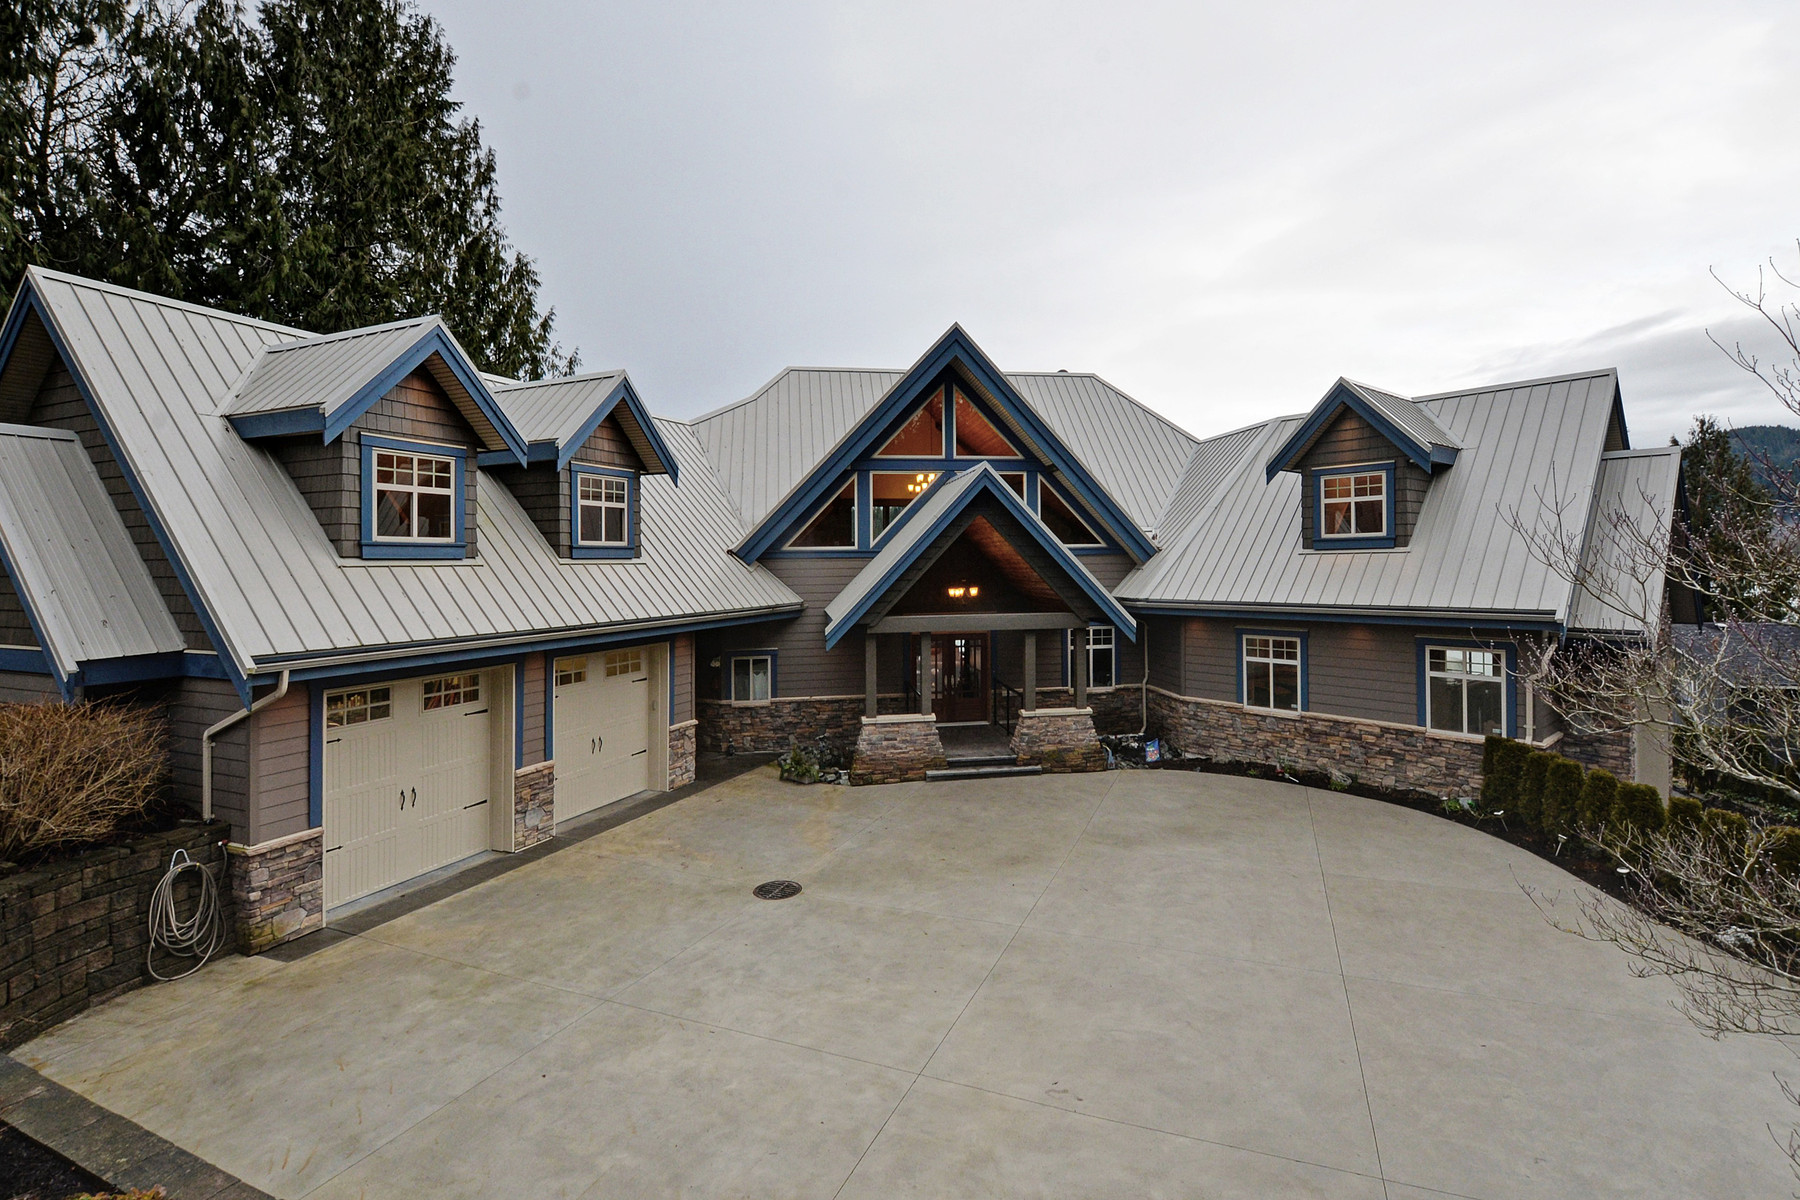 Property For Sale at Mission, Fraser Valley